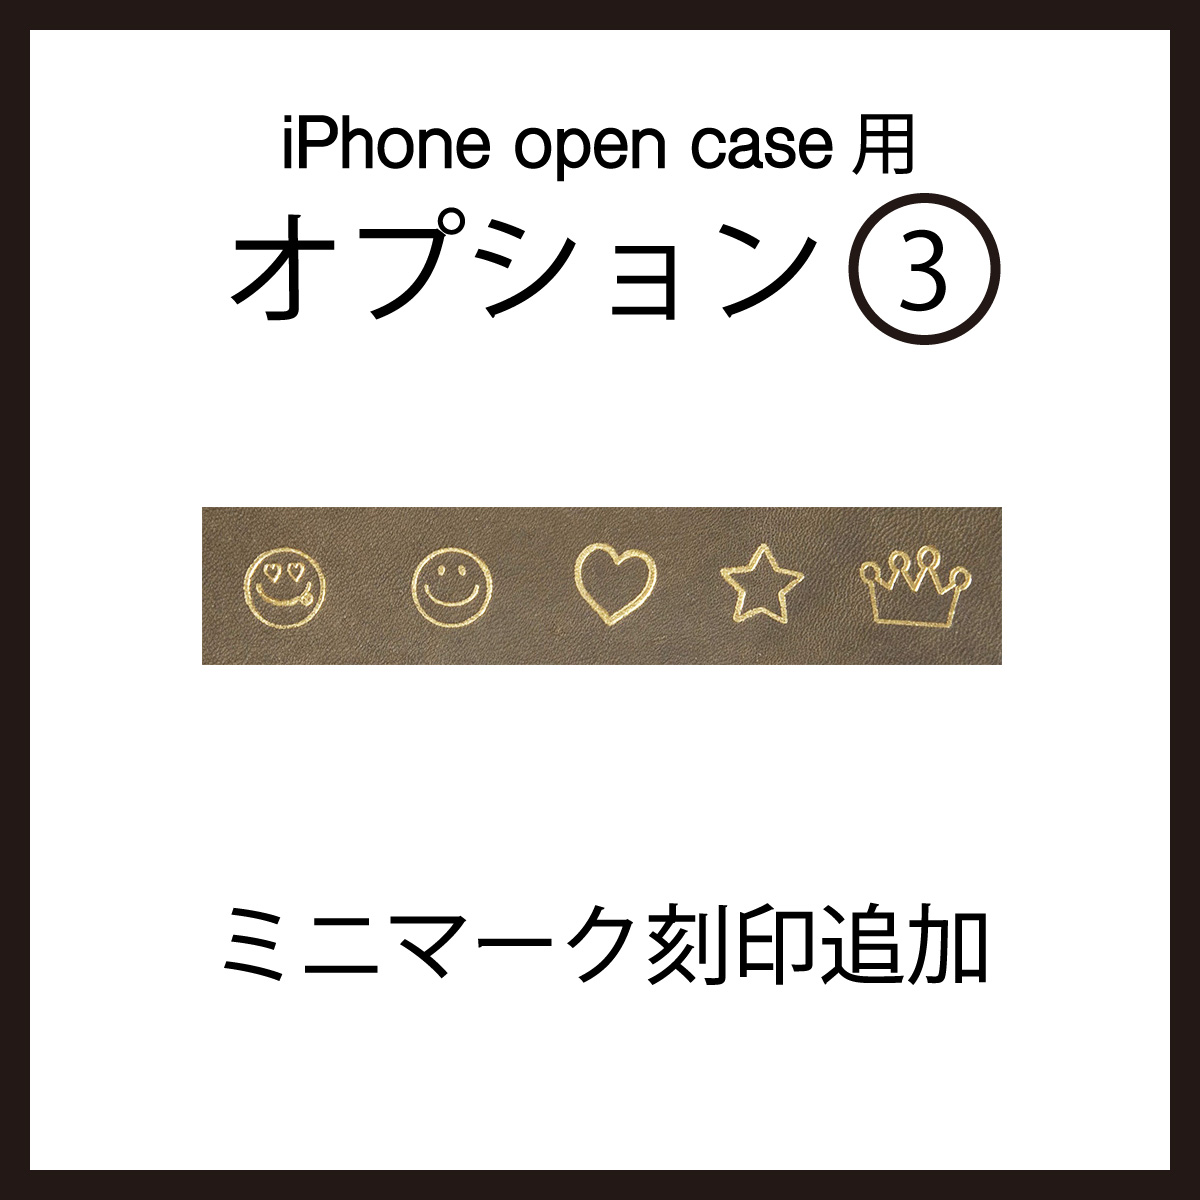 iPhoneOpenCase:    Option3:ミニマーク刻印追加